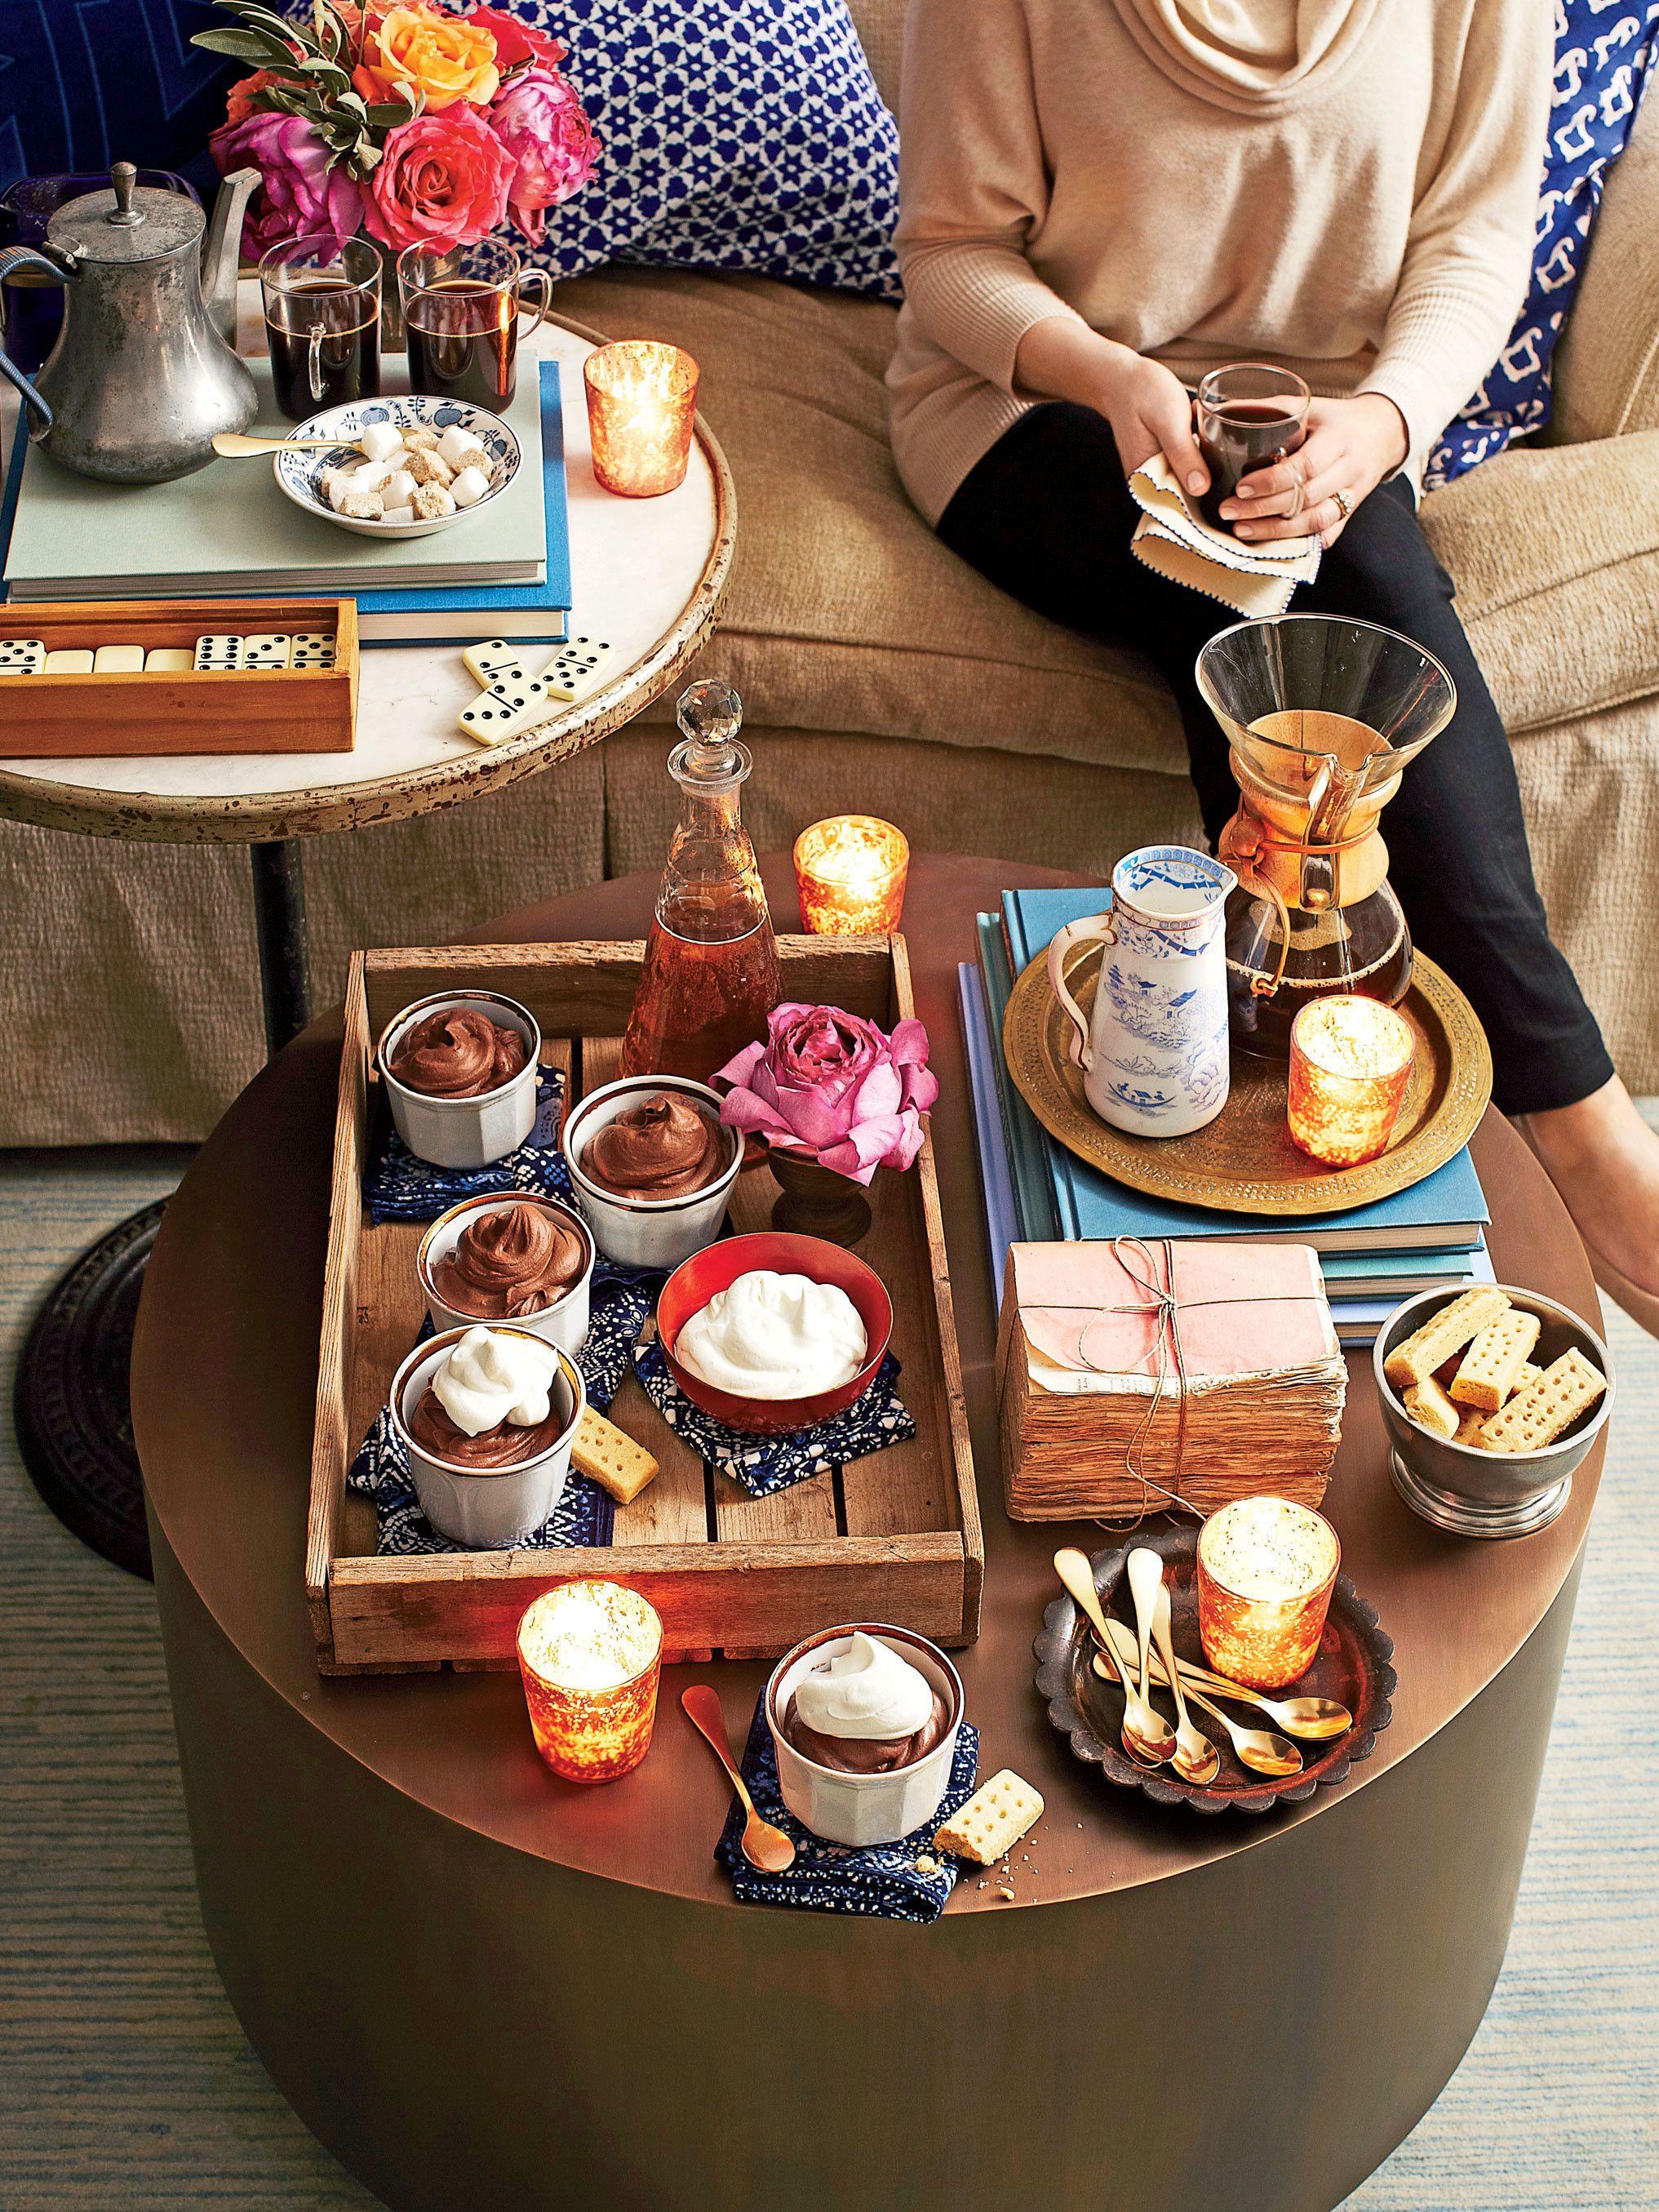 How To Host The Perfect Supper Club | Supper club menu ...